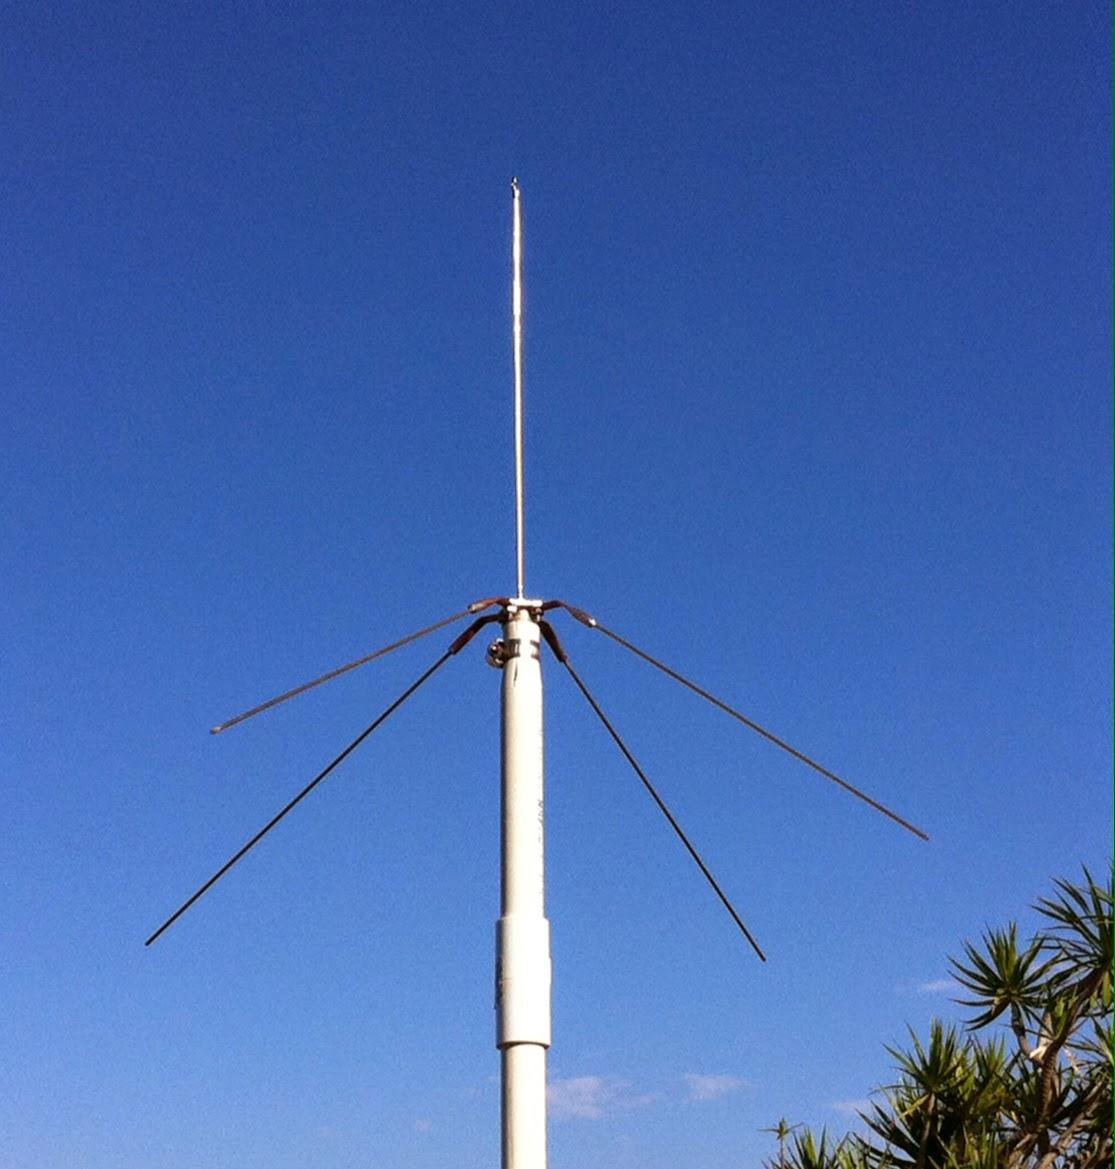 WA6PZB: 220 Mhz Ground Plane Antenna